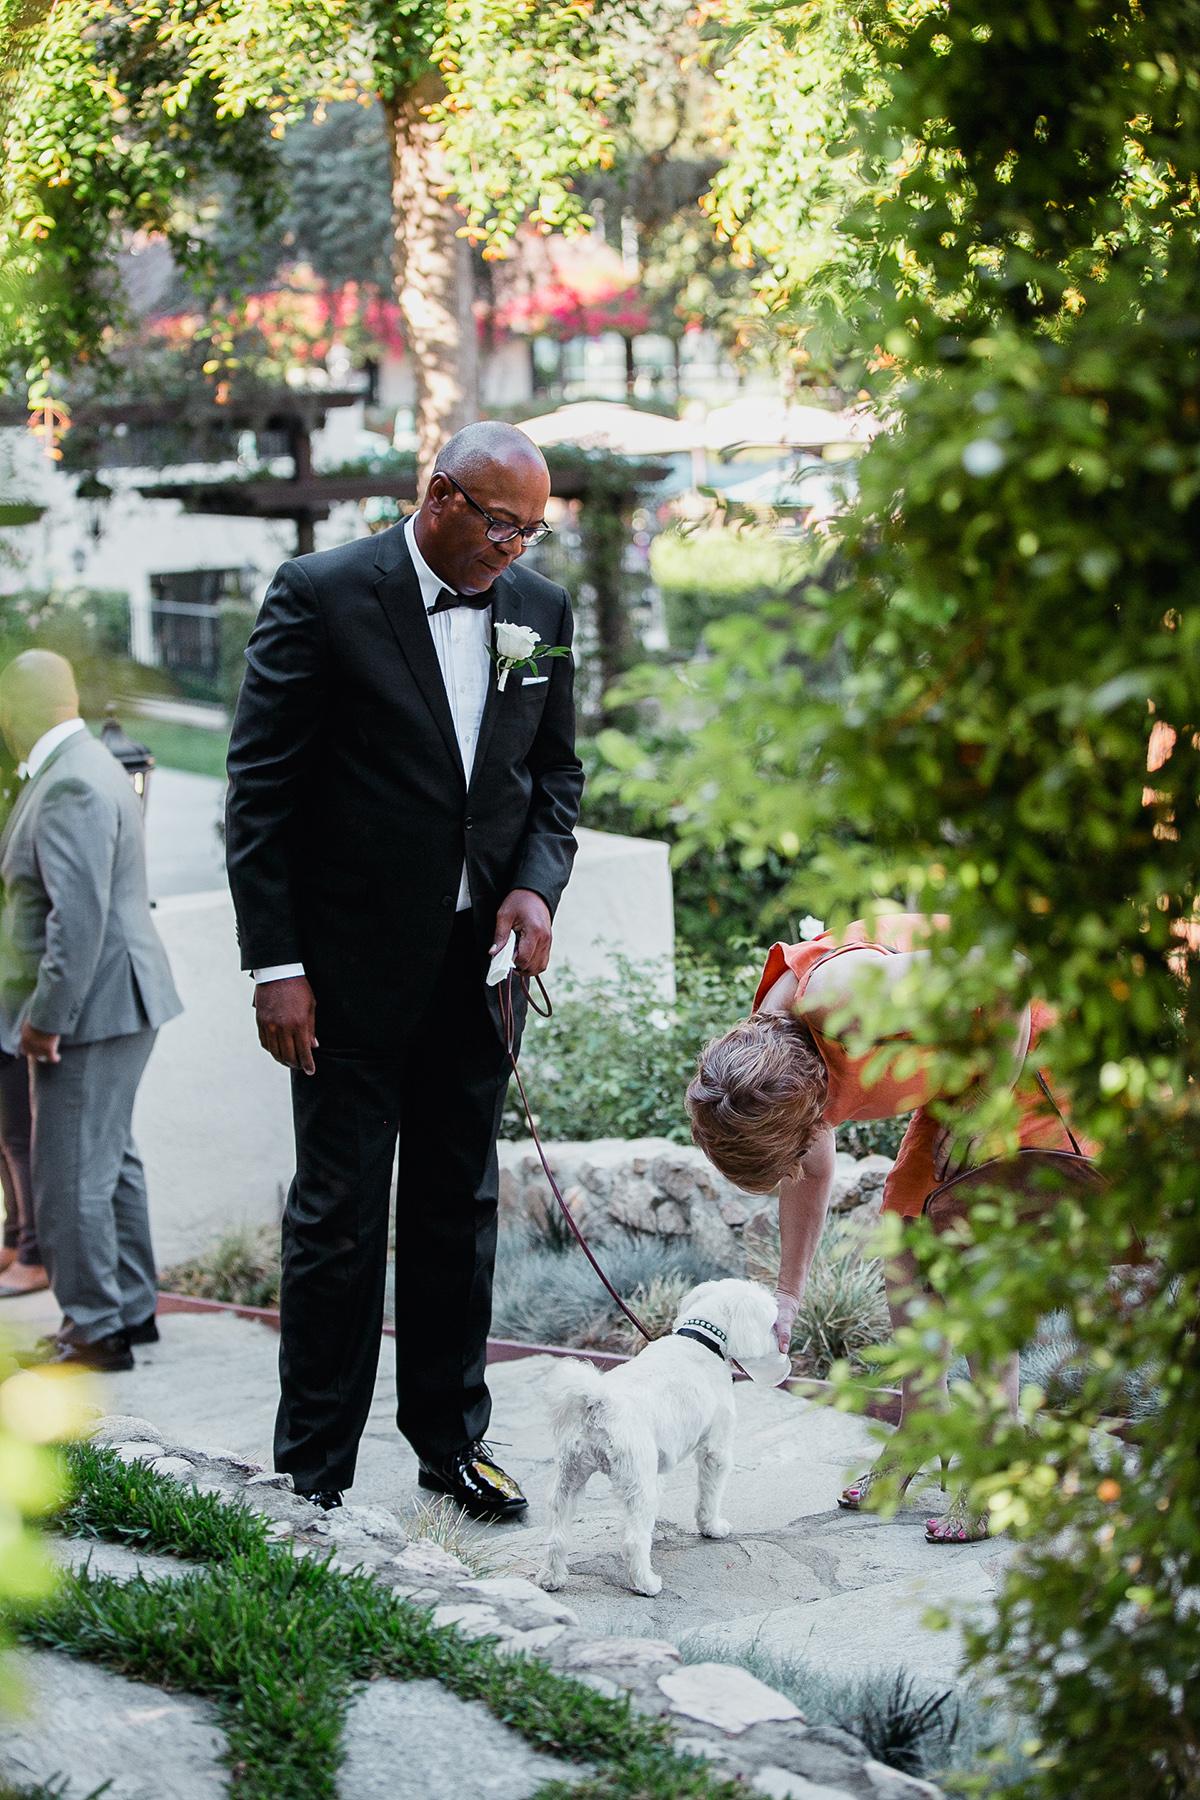 marla_david_wedding_042.jpg